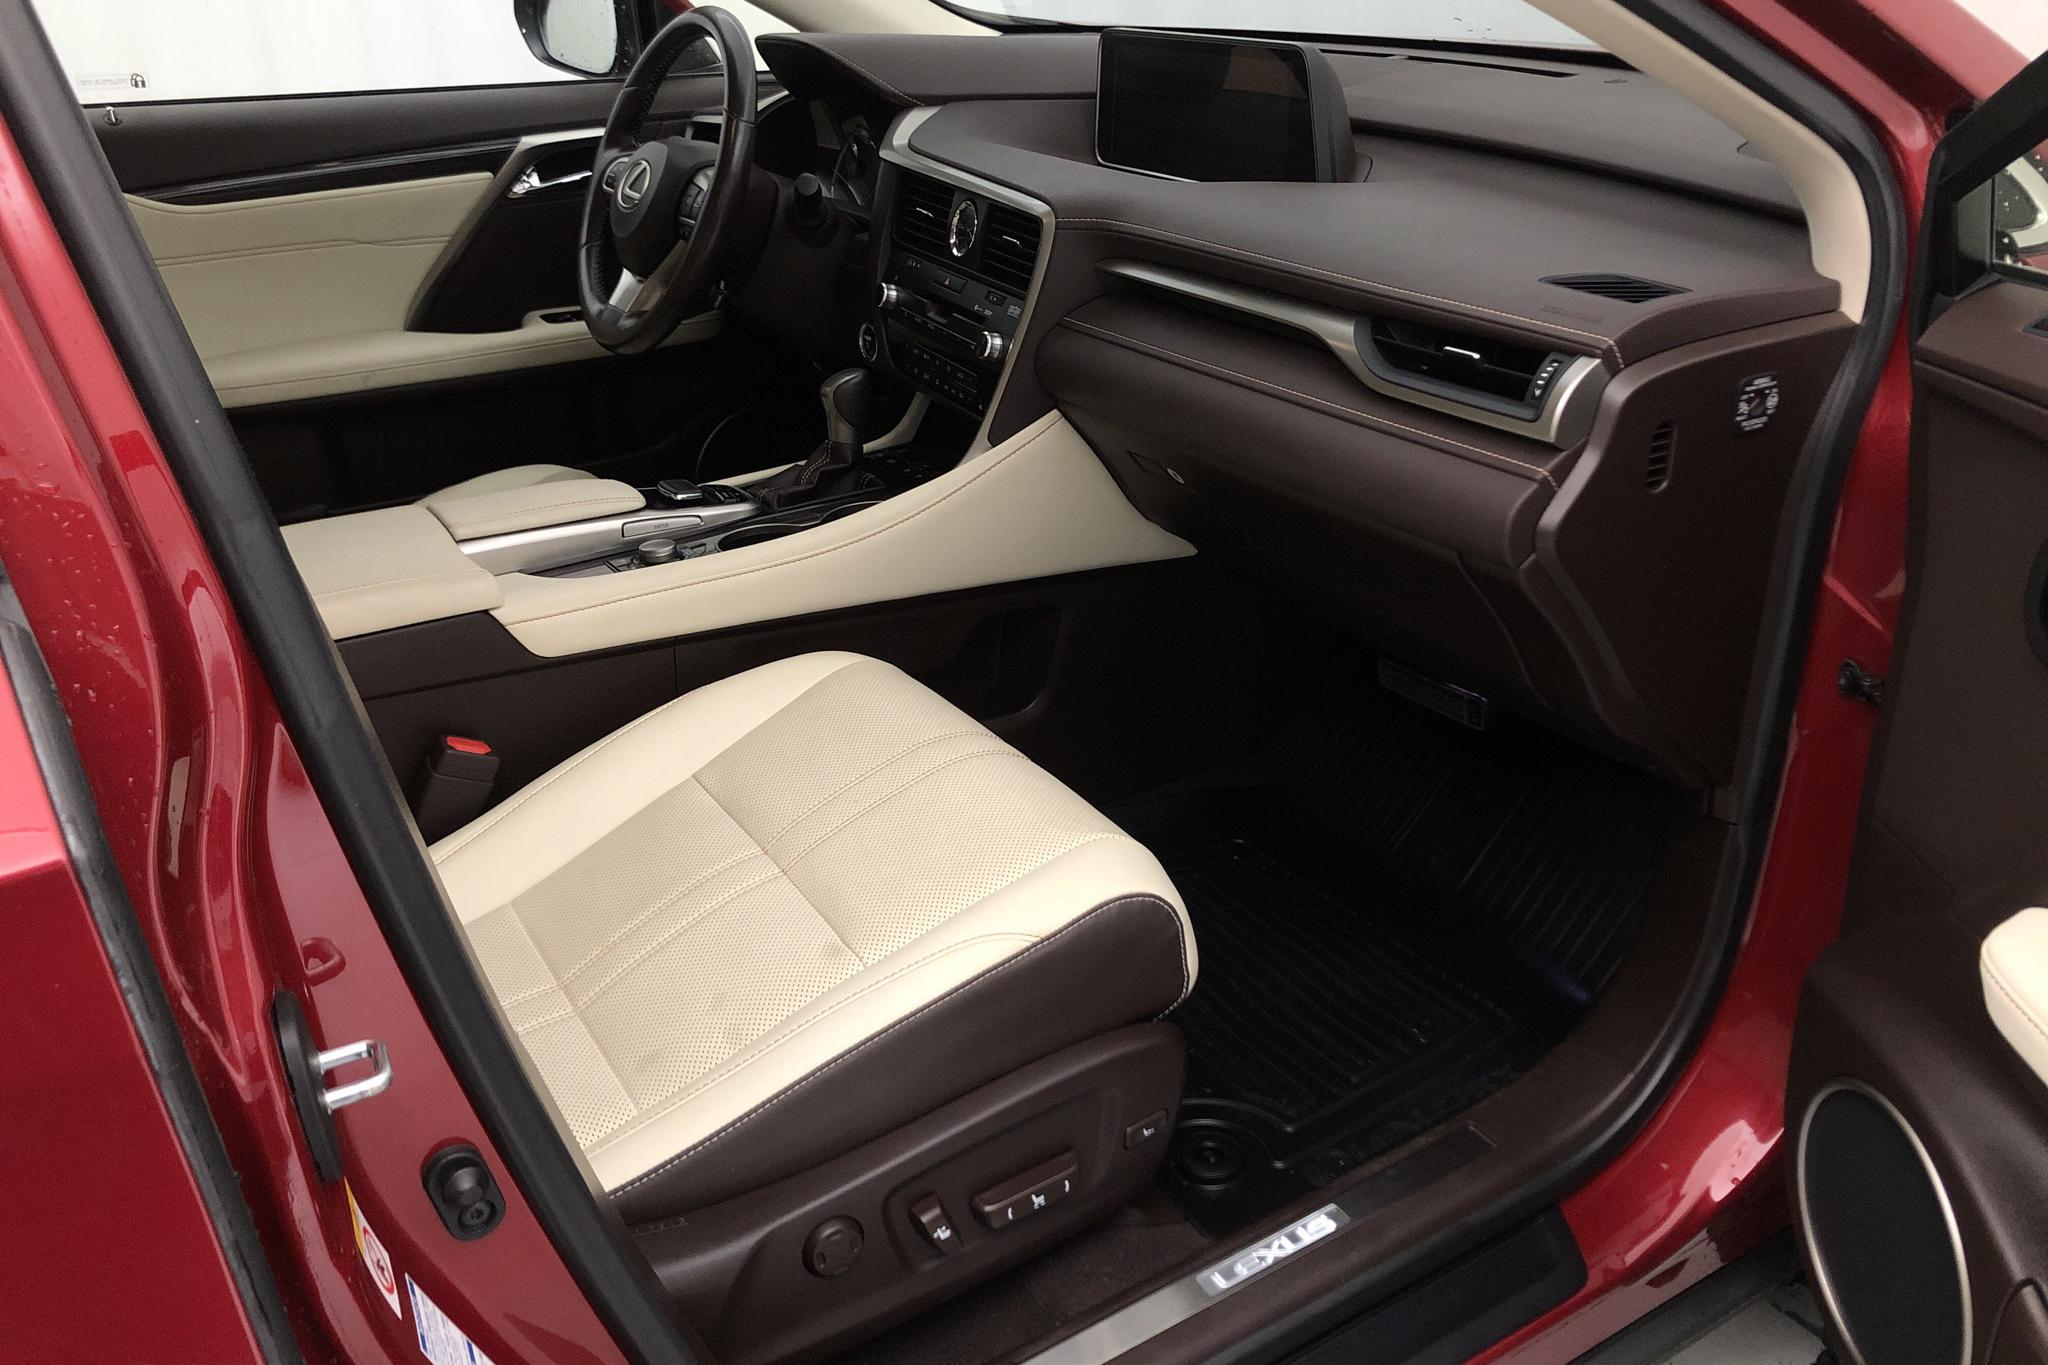 Lexus RX 450h AWD (313hk) - 83 930 km - Automatic - red - 2016